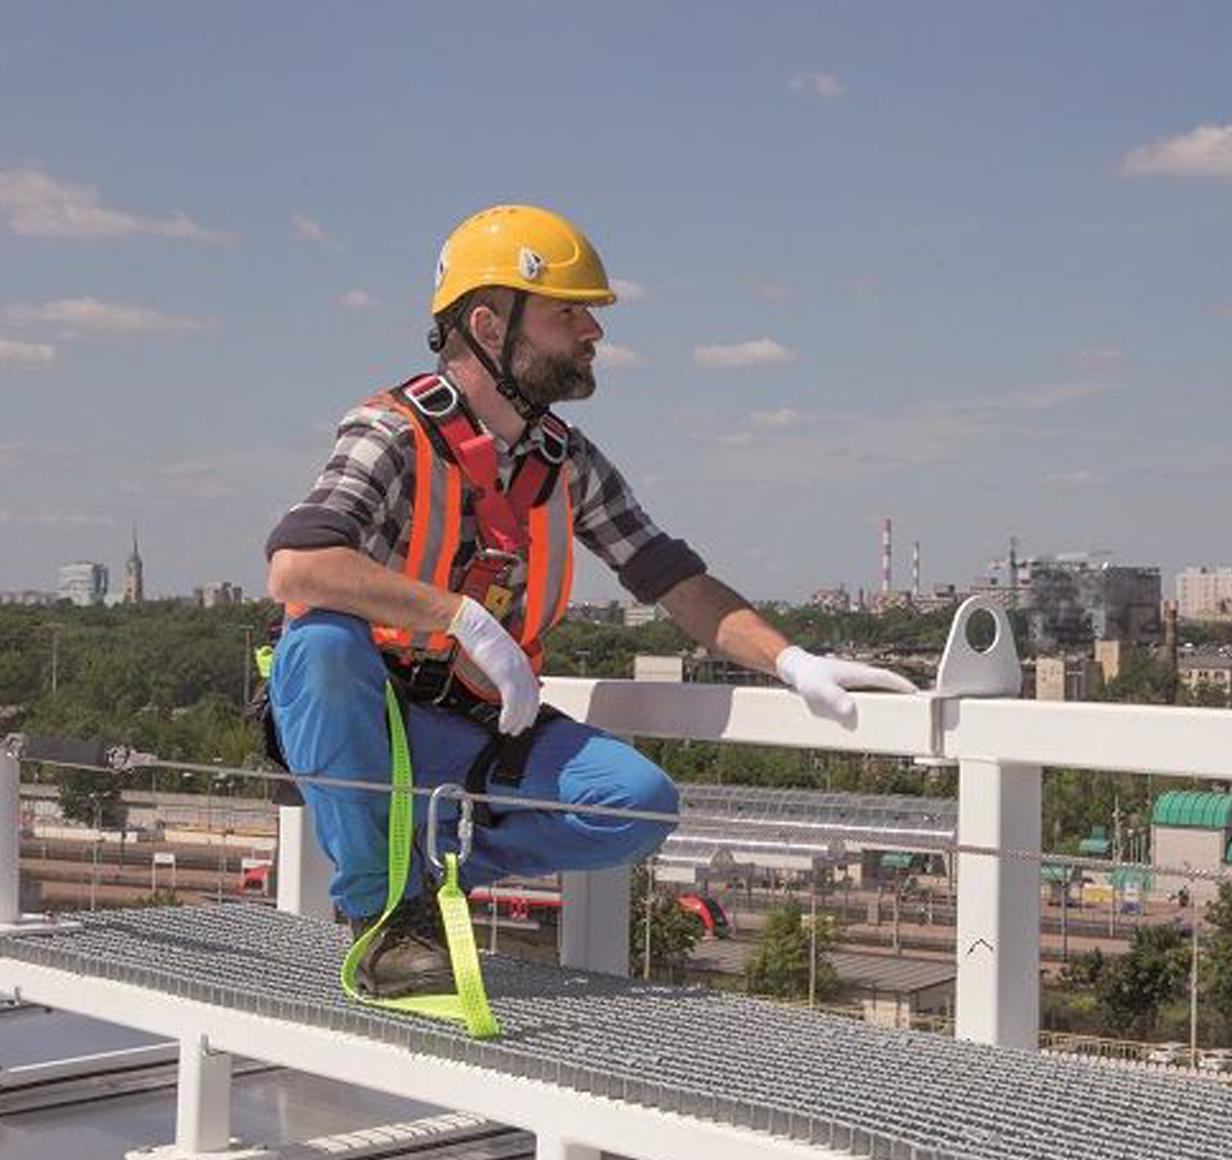 Installation safety system